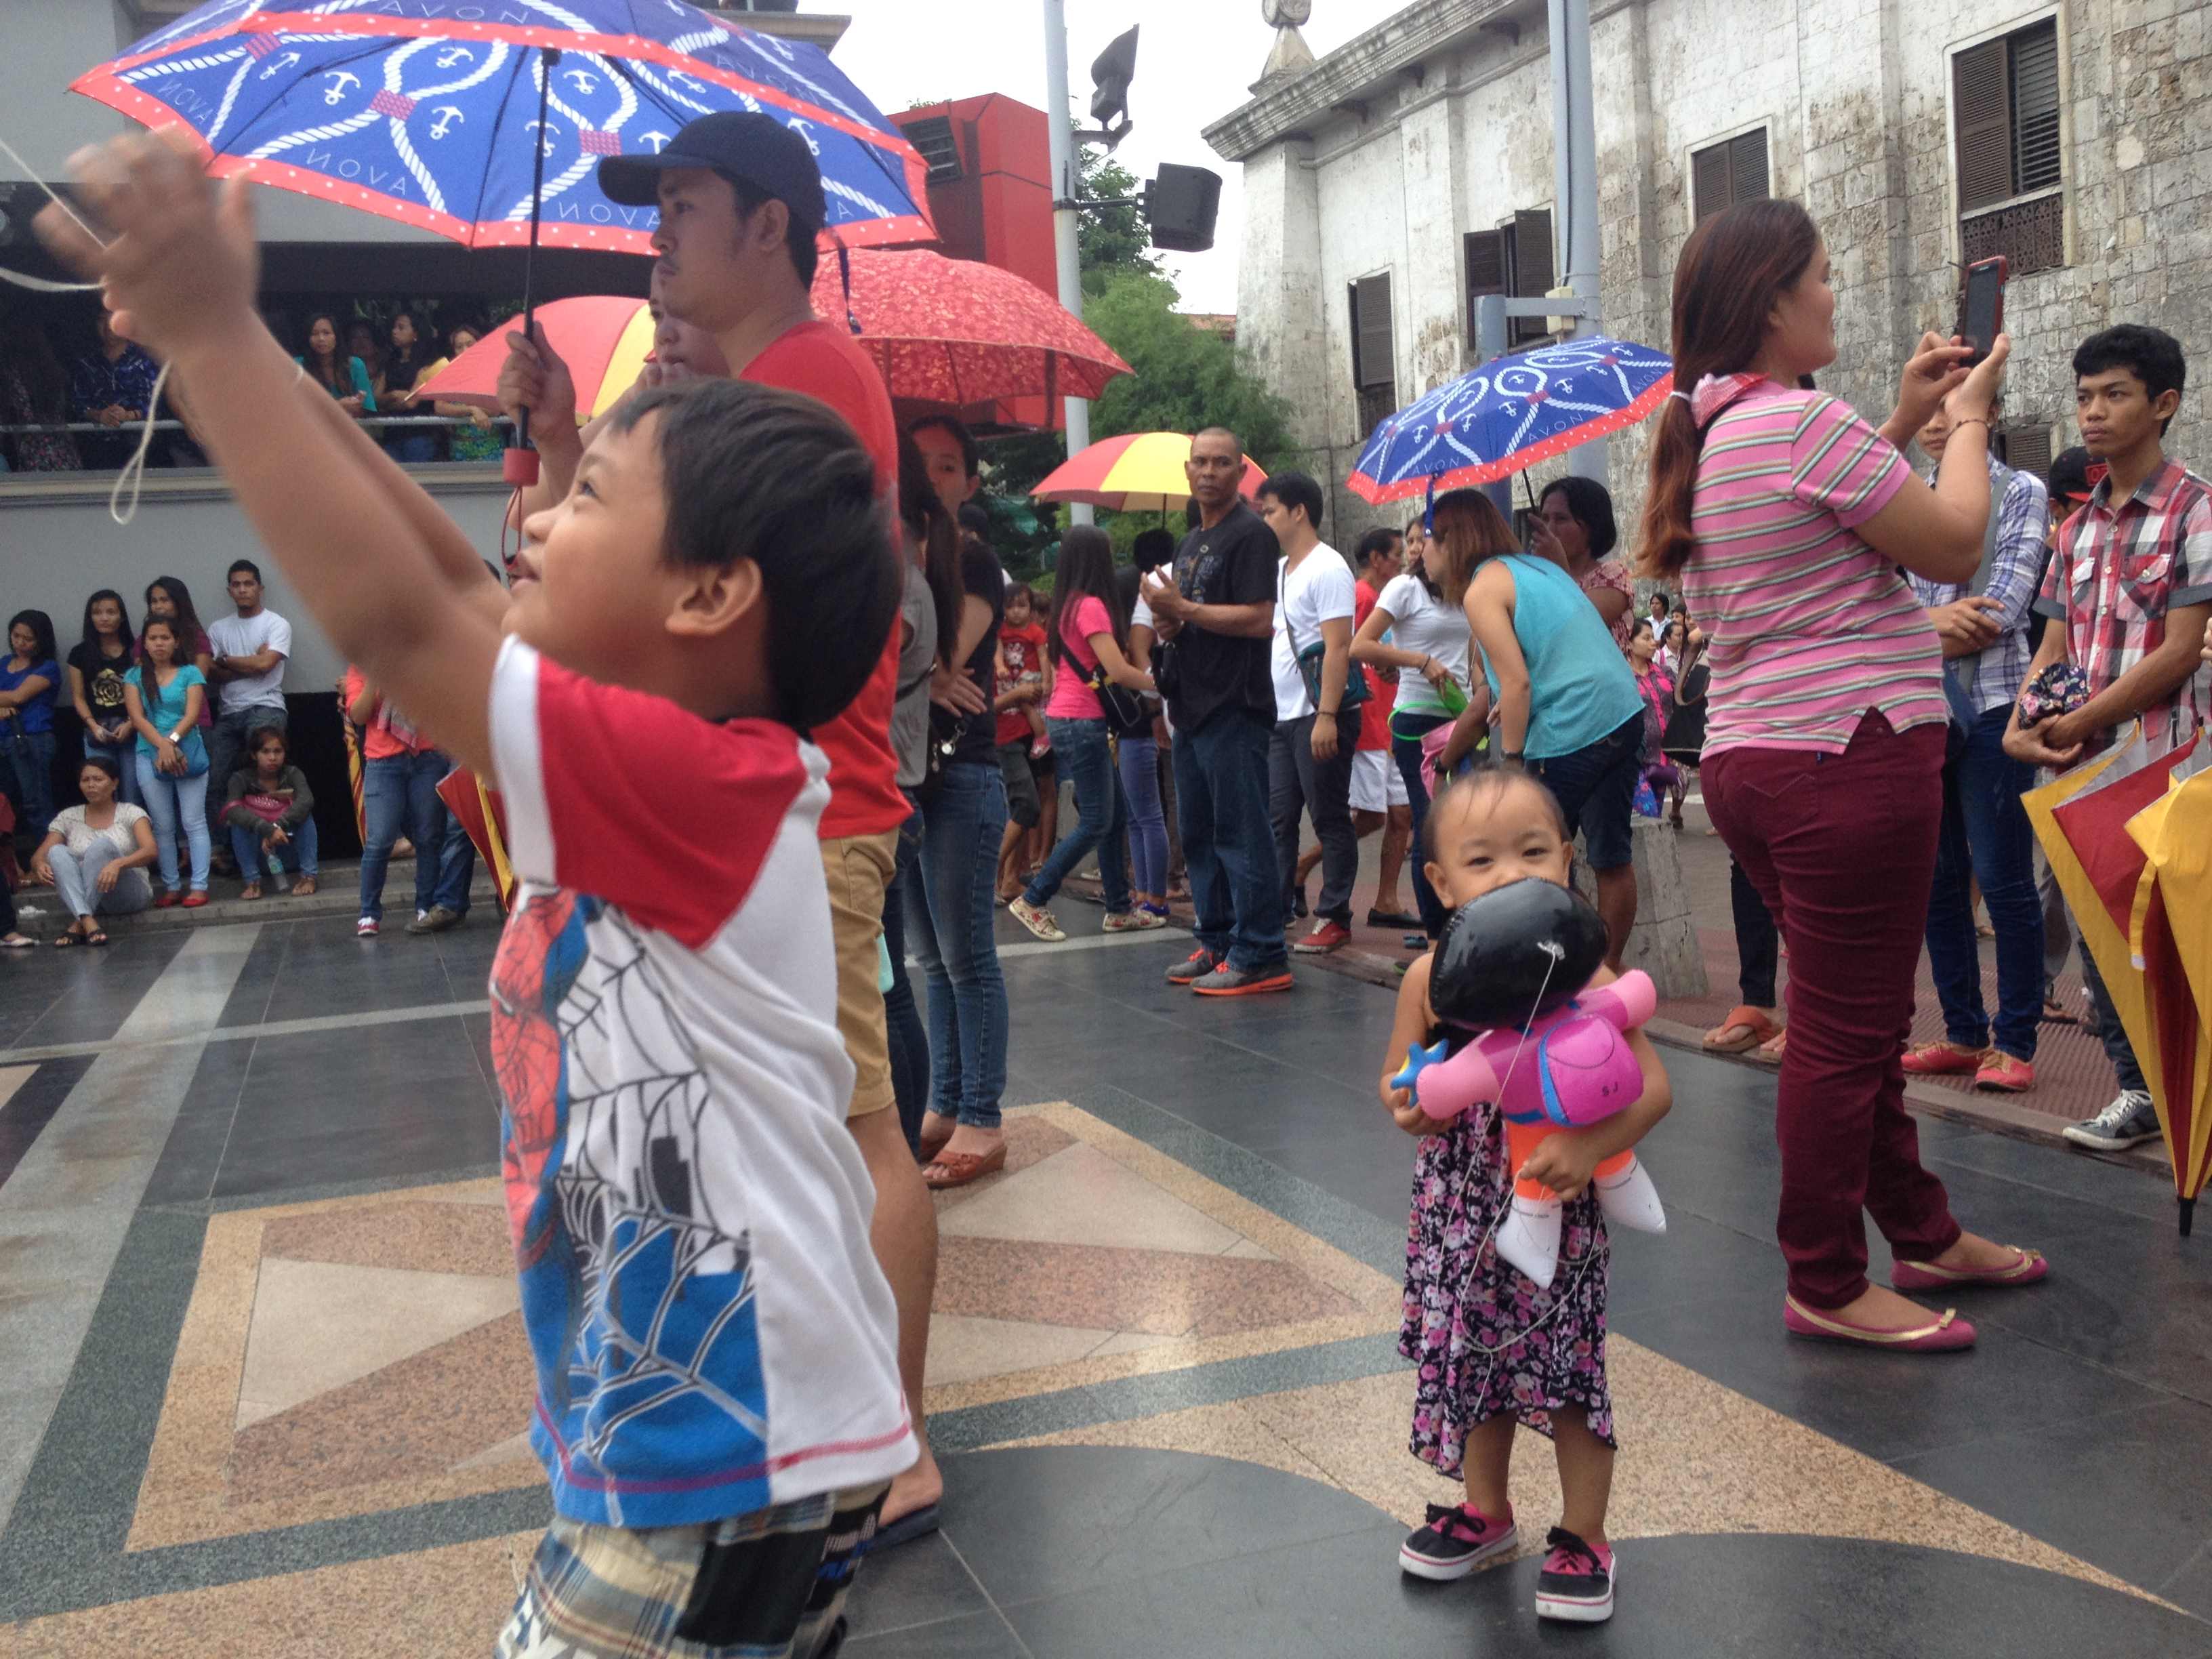 Basilica del Santo Nino, Cebu @oltreilbalcone